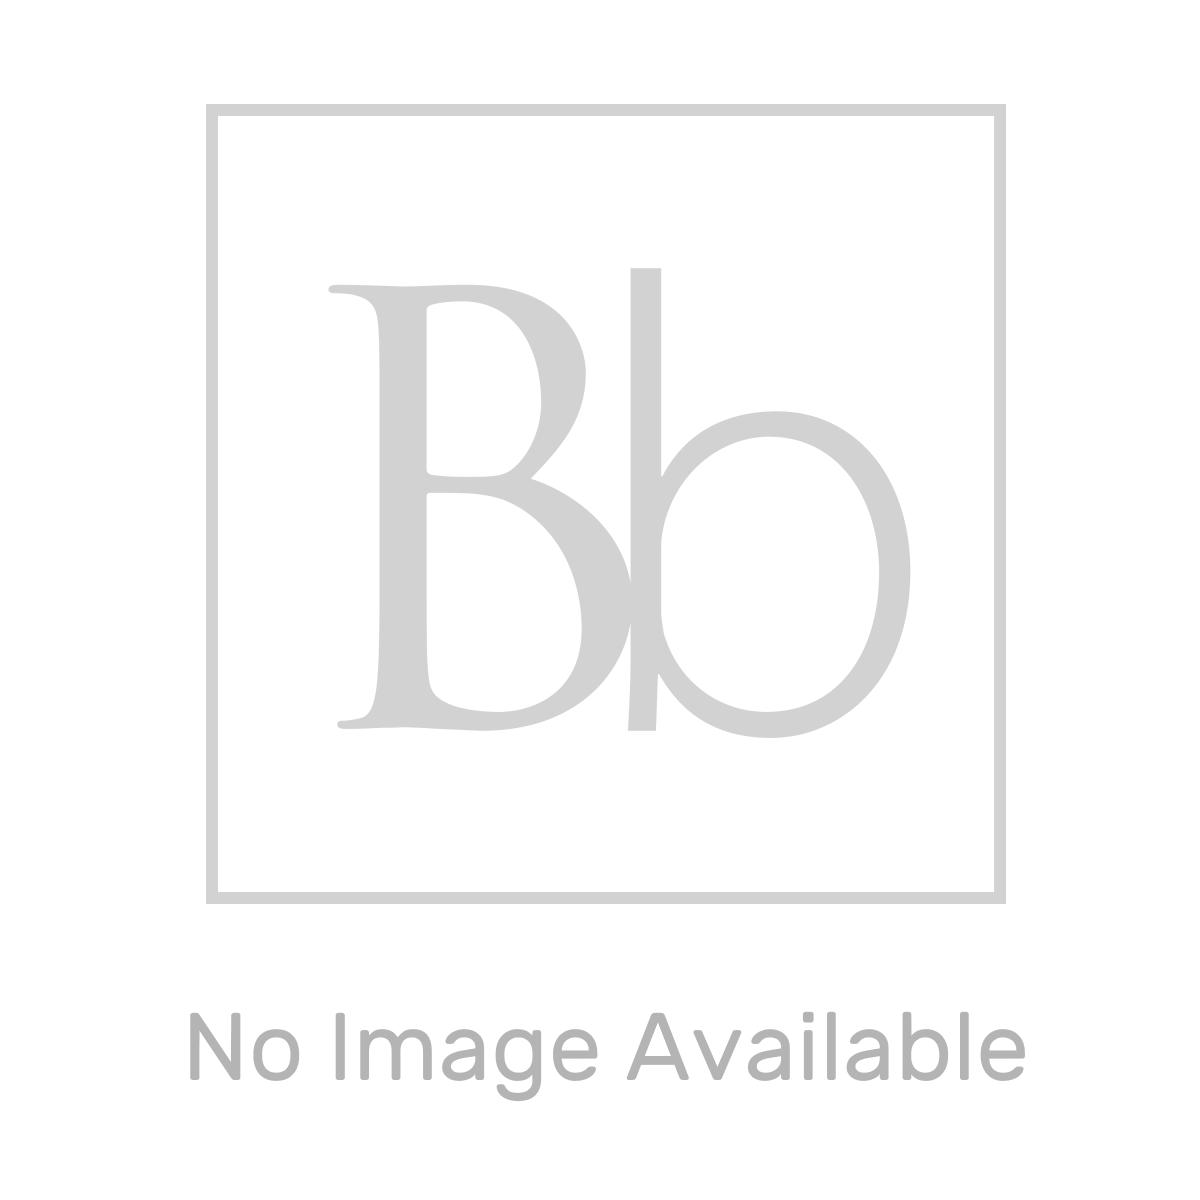 RAK Tonique Wall Hung Hidden Fixation Toilet with Soft Close Seat Measurements